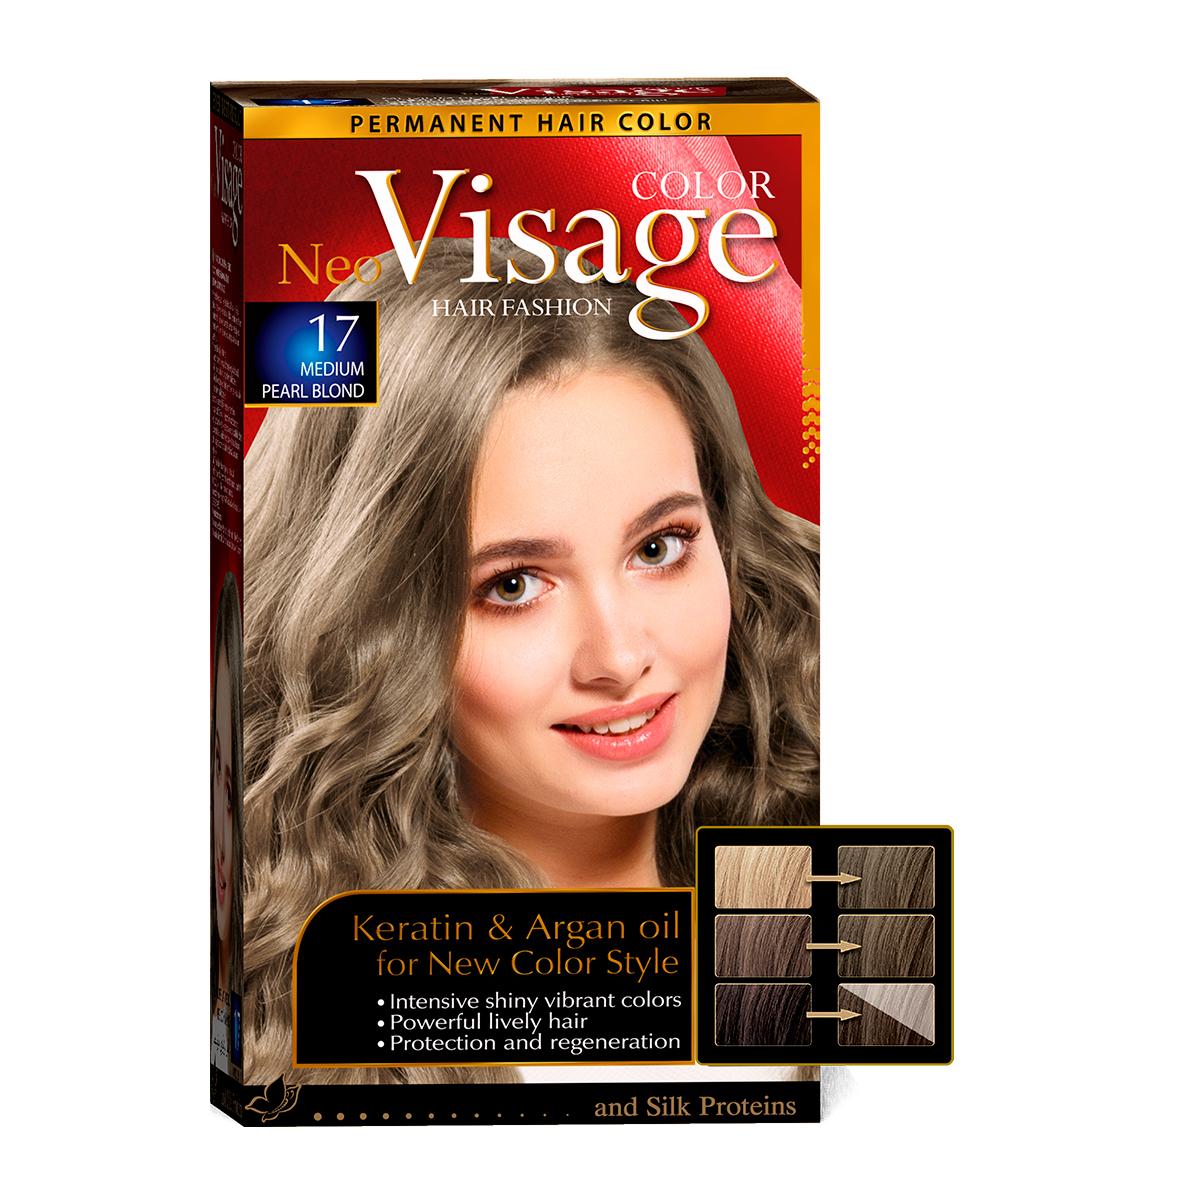 17 Средне-перламутровый русый / Medium Pearl Blond